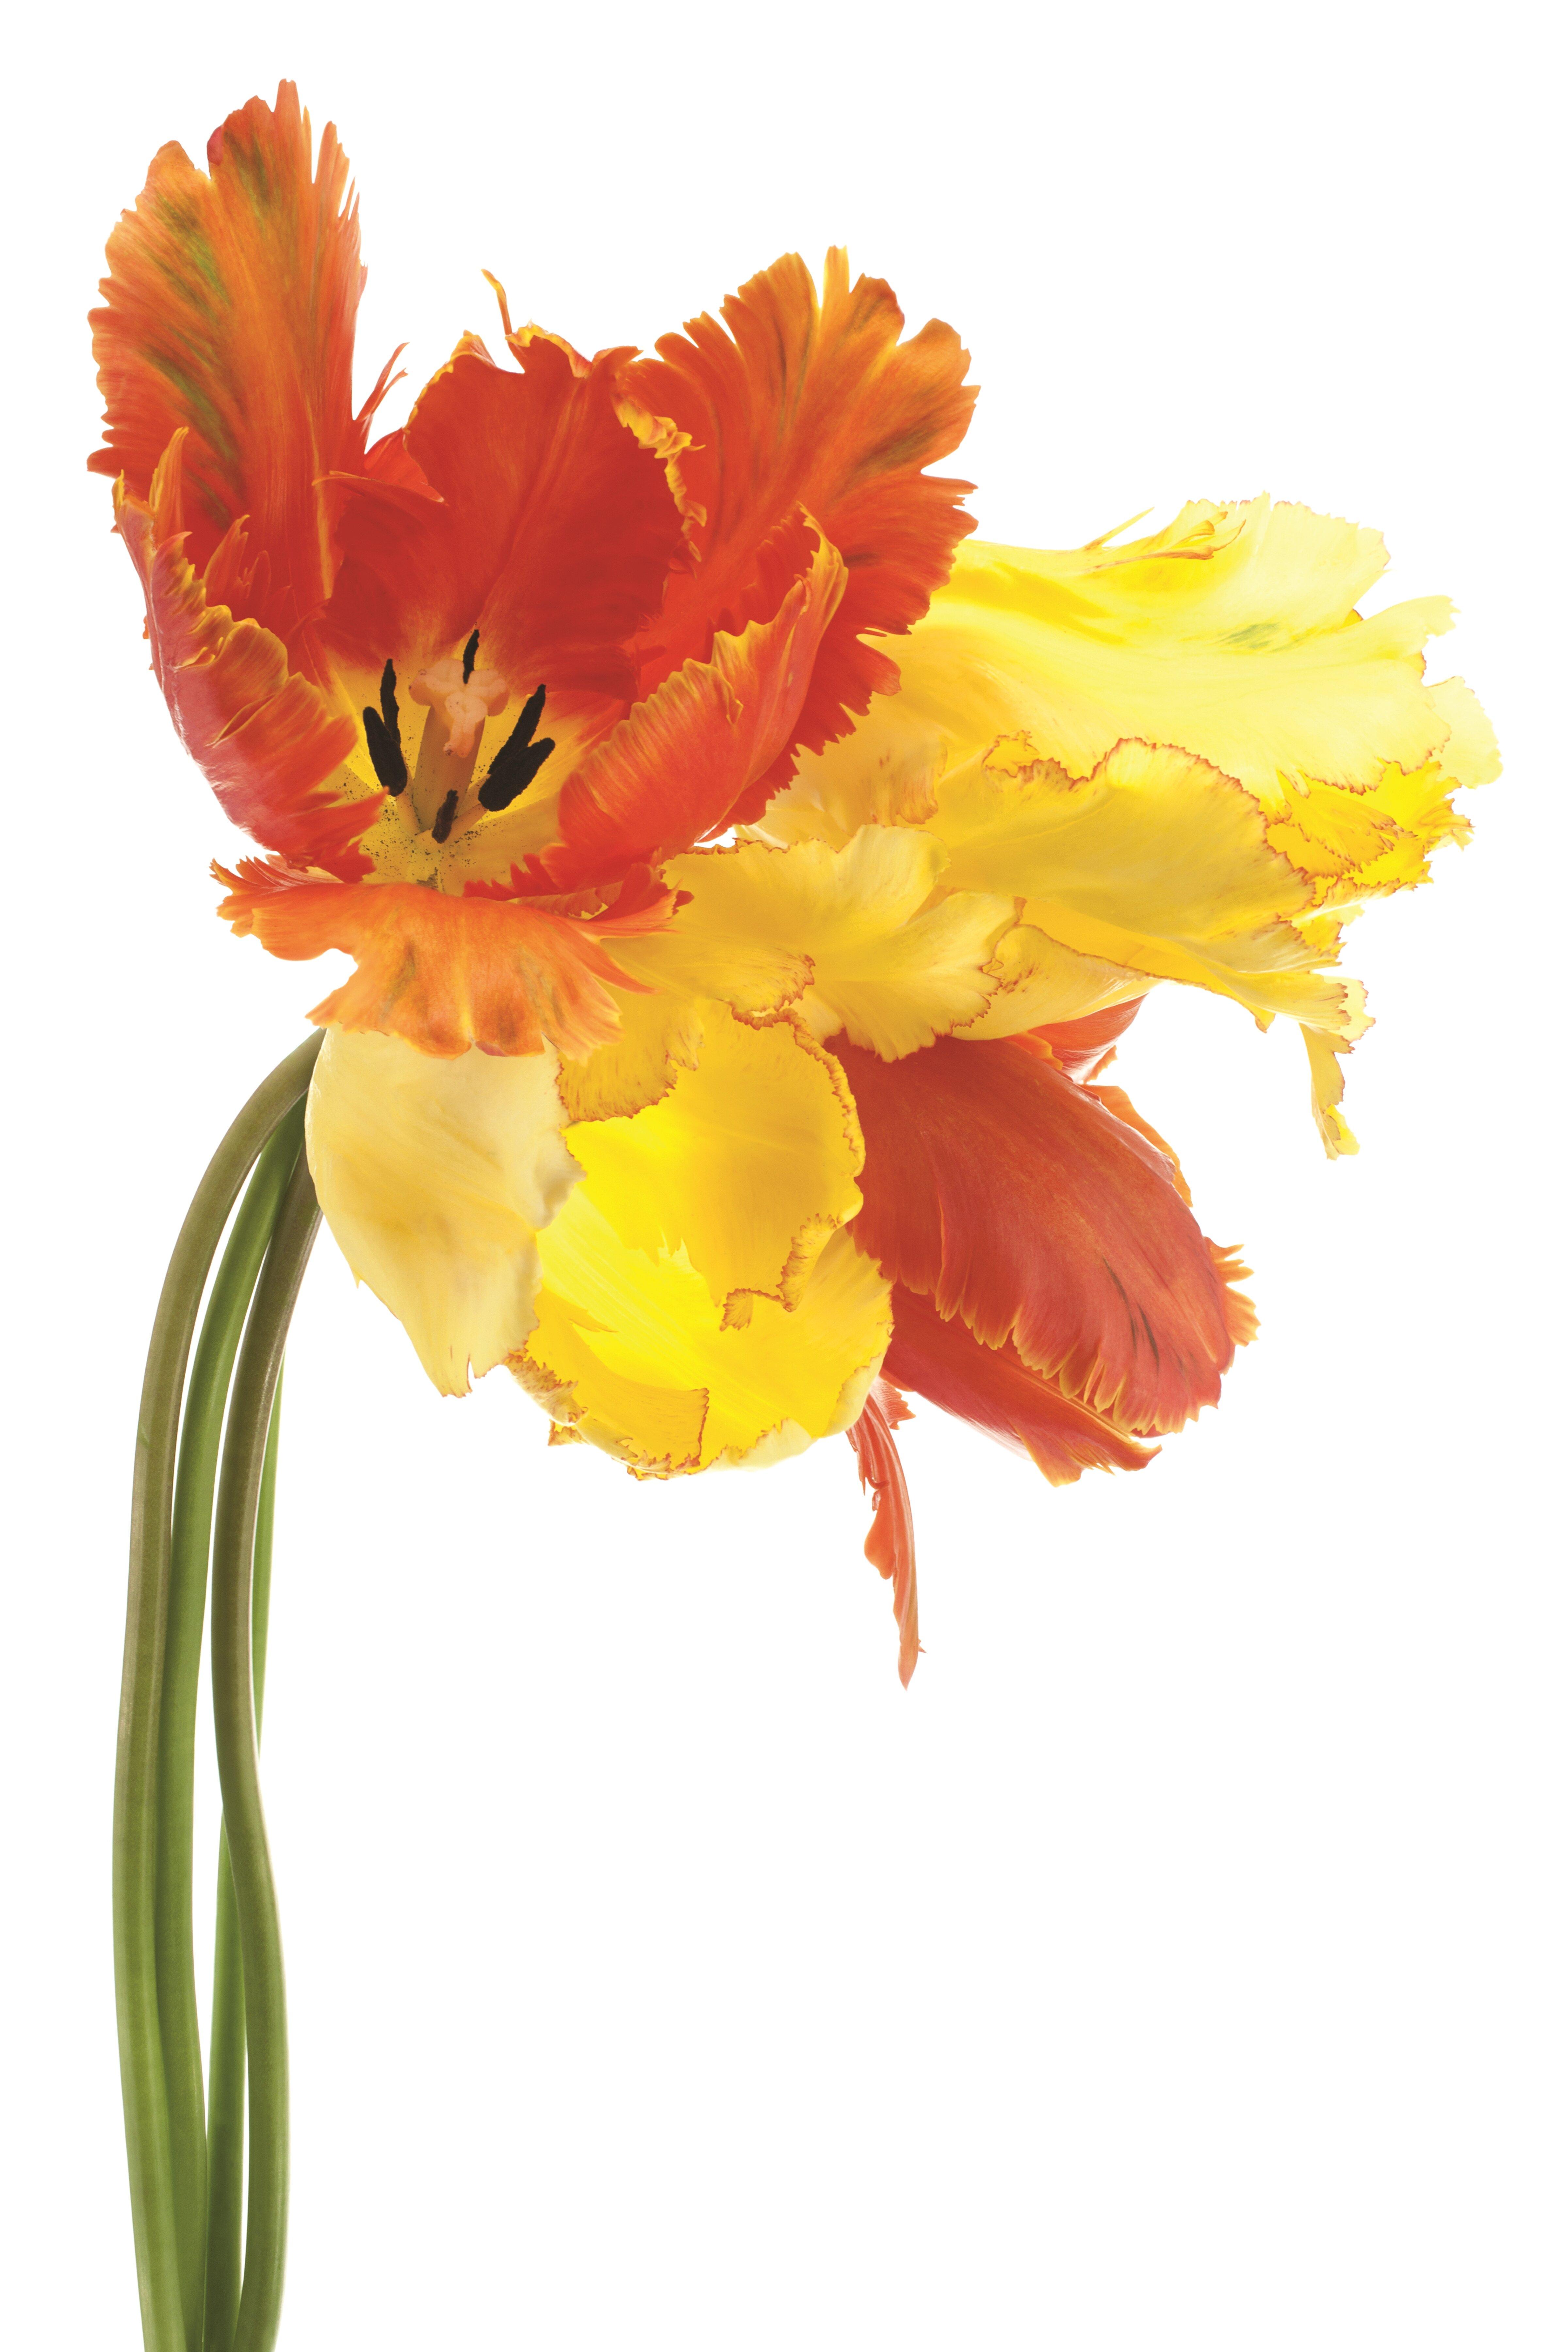 Empire Art Direct \'Orange Yellow Parrot Tulip on White\' Graphic Art ...